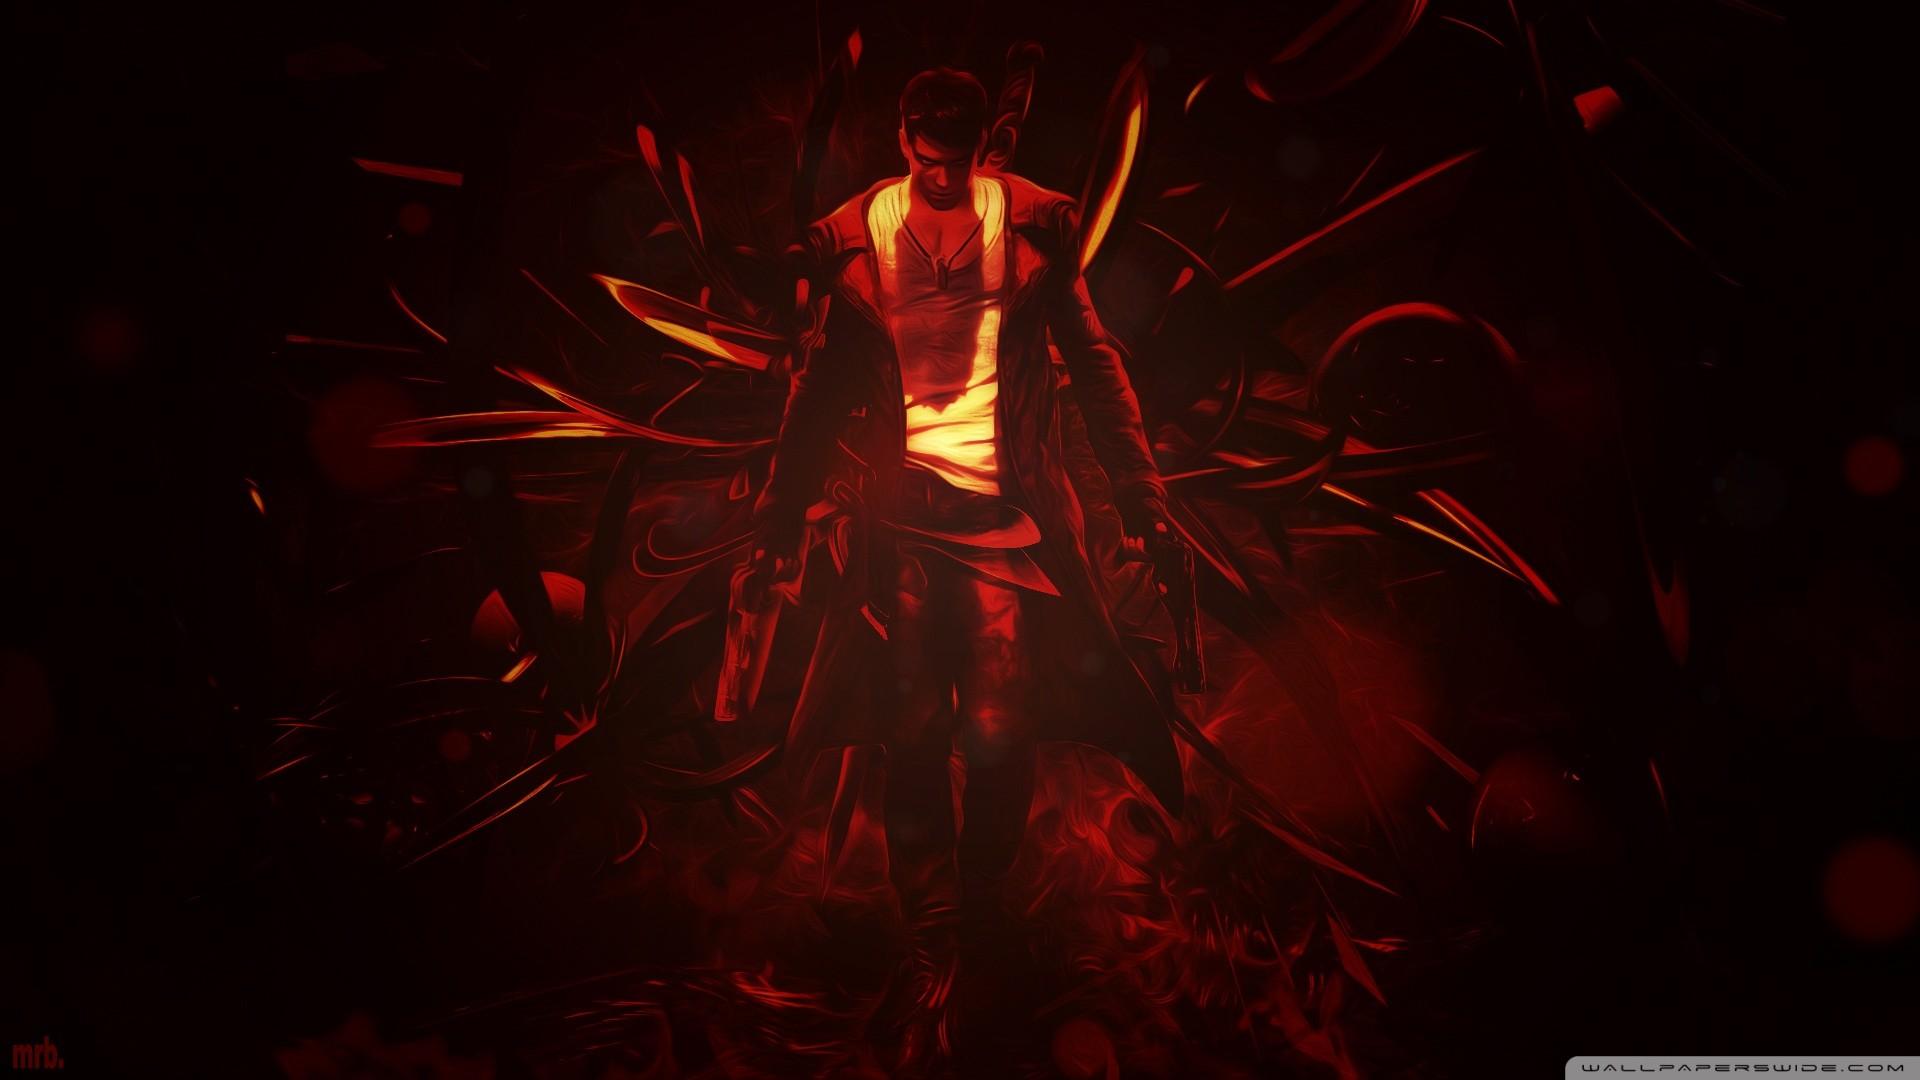 Devil May Cry Hd Wallpaper Devil, May, Cry, Hd